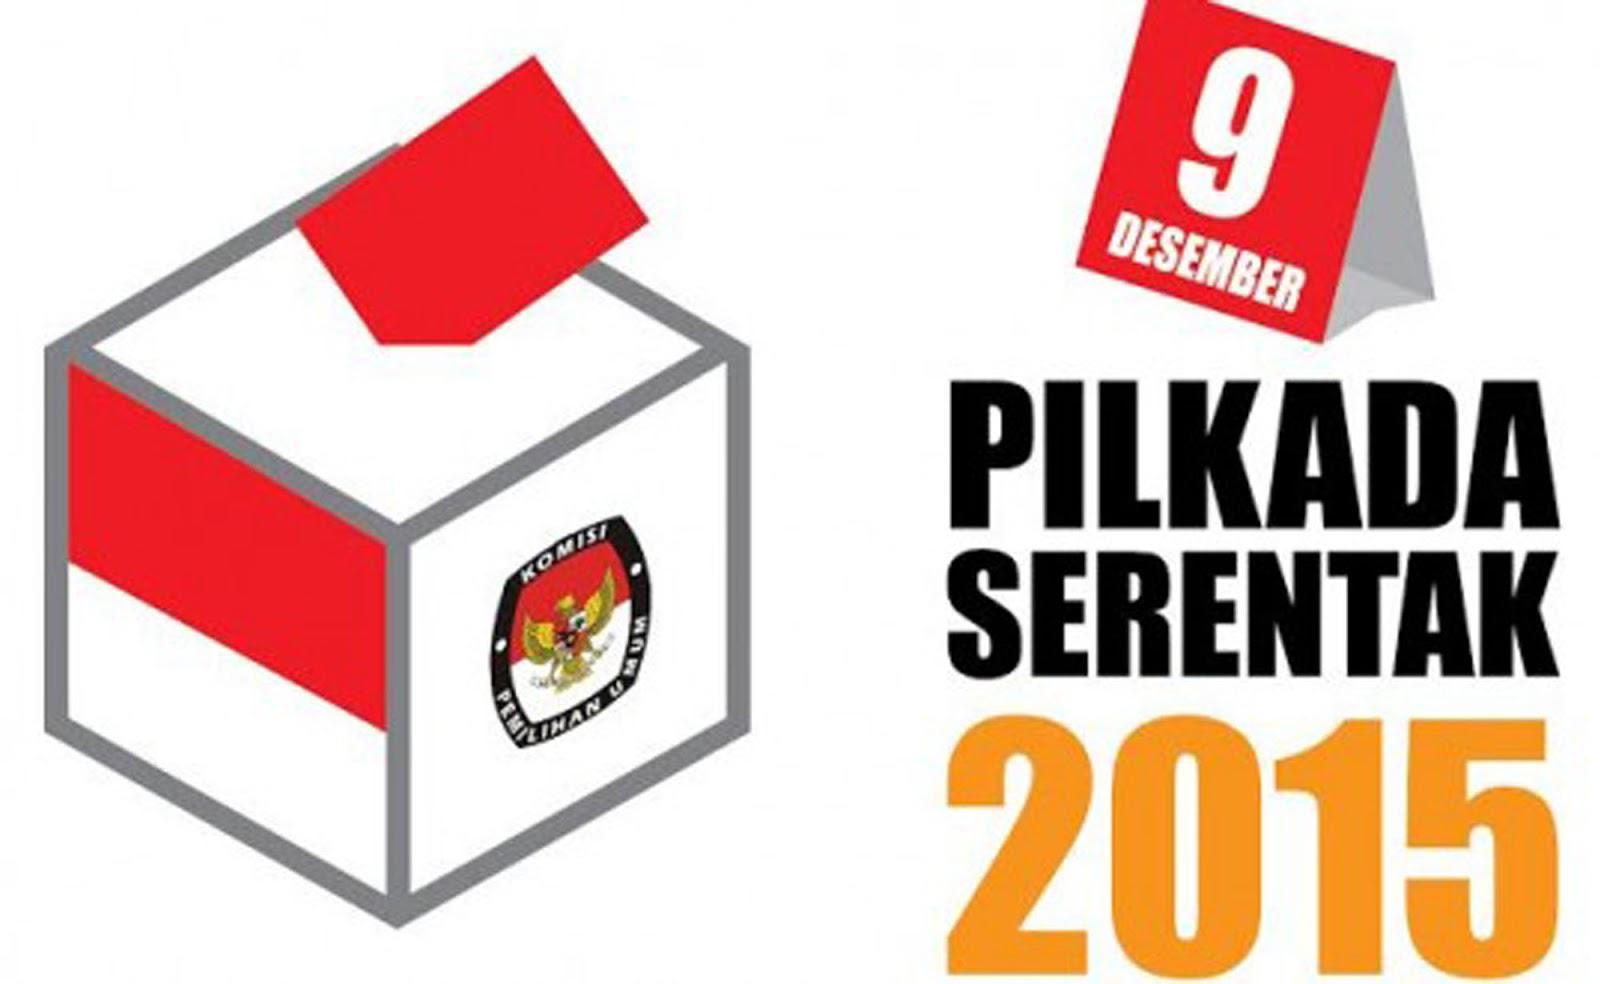 Pilkada Serentak 2015